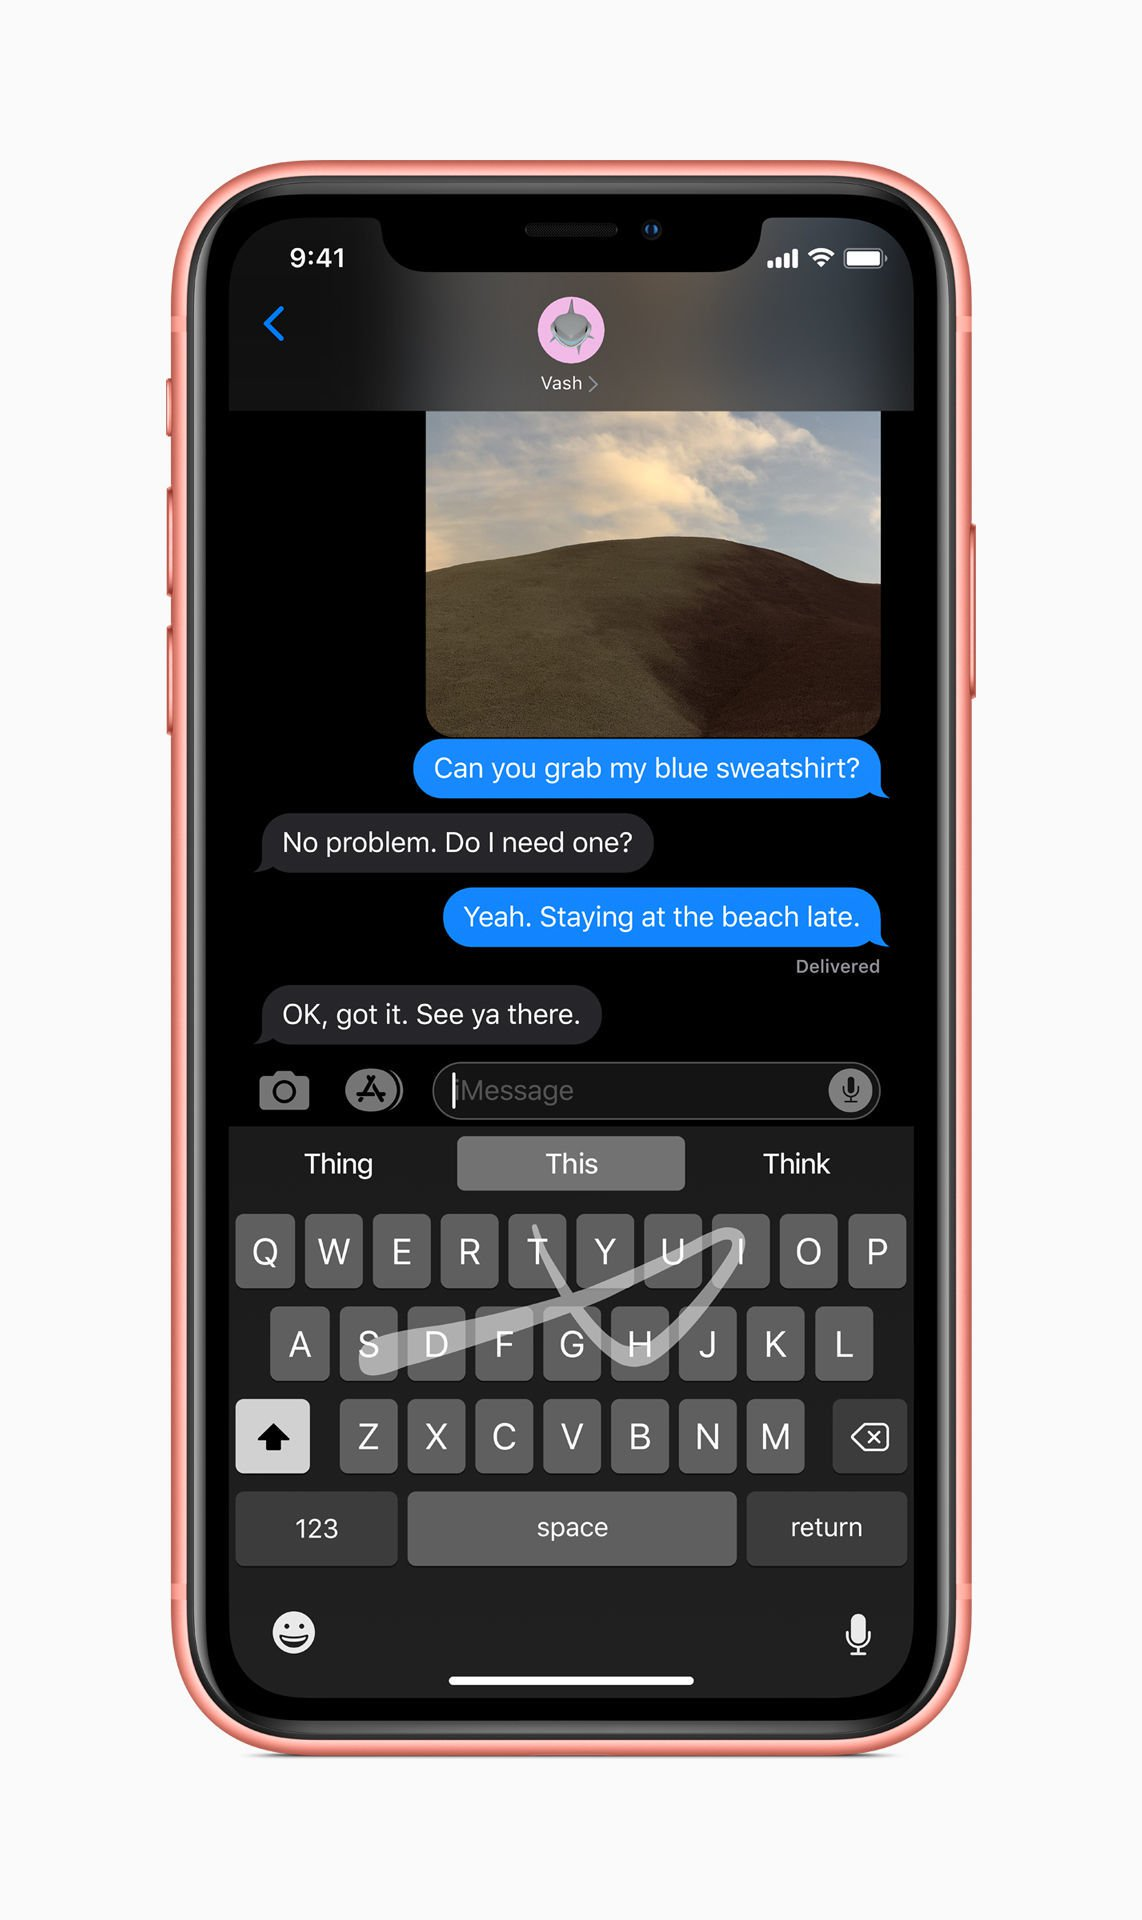 Revisión de iOS 13: tecleo deslizable